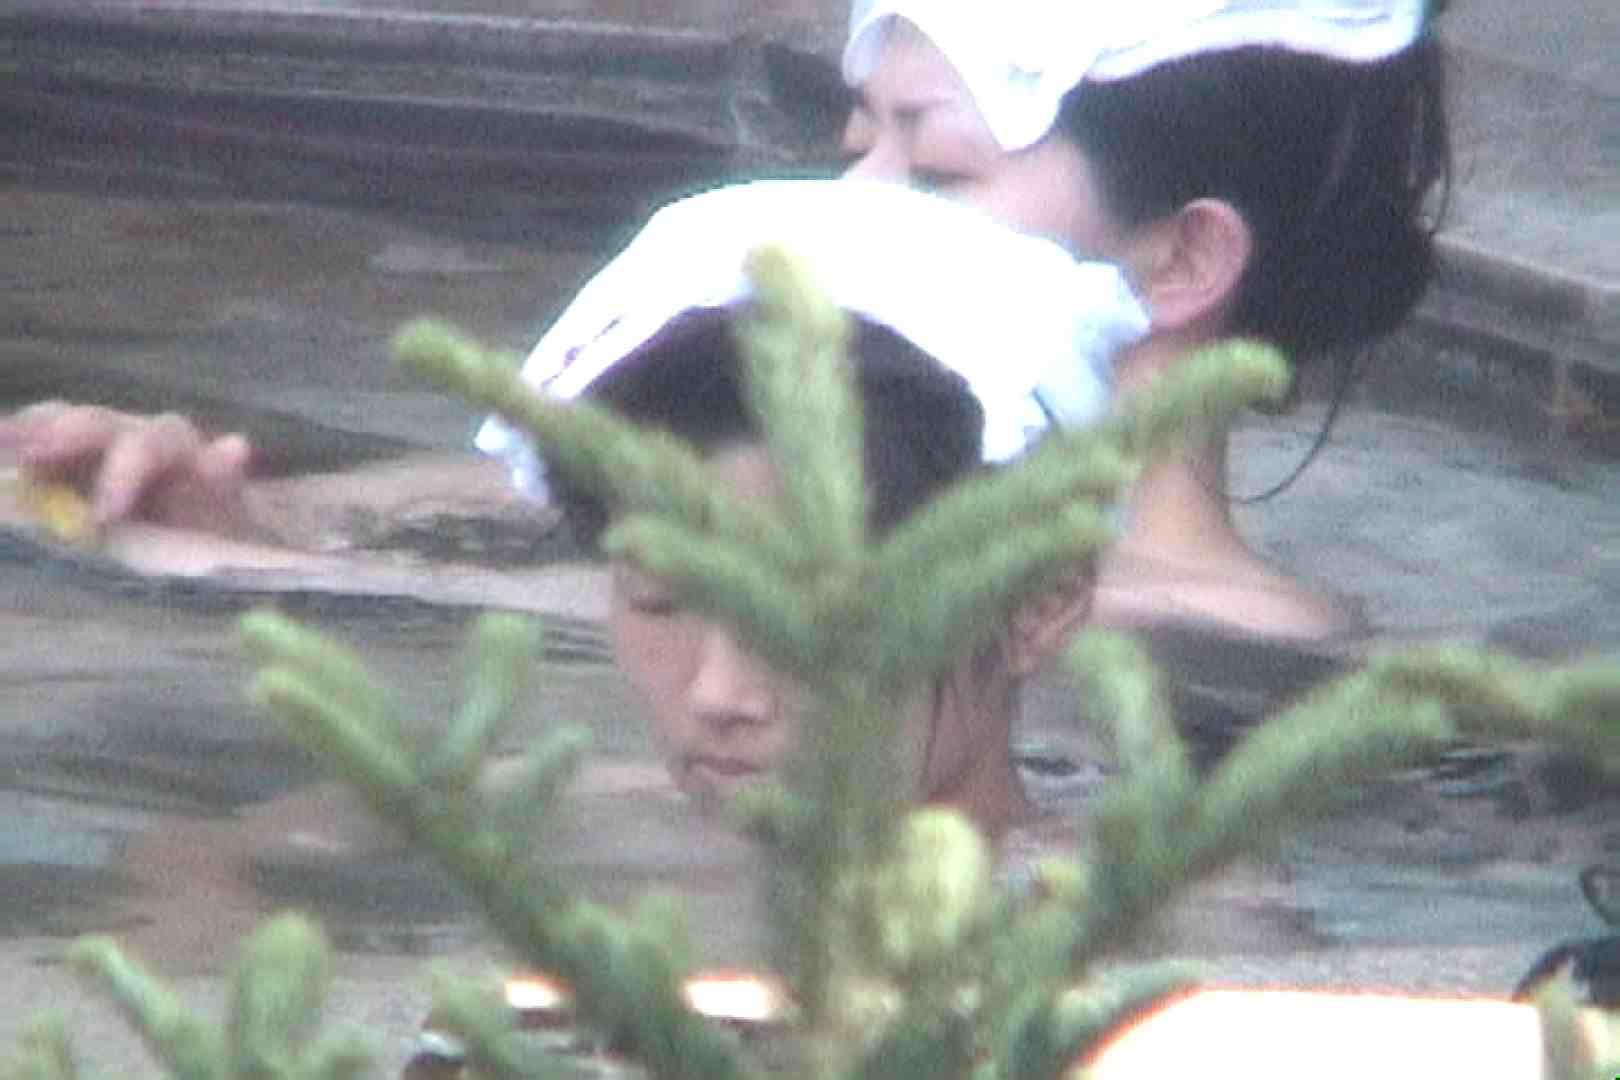 Aquaな露天風呂Vol.80【VIP限定】 盗撮大放出 濡れ場動画紹介 73連発 38